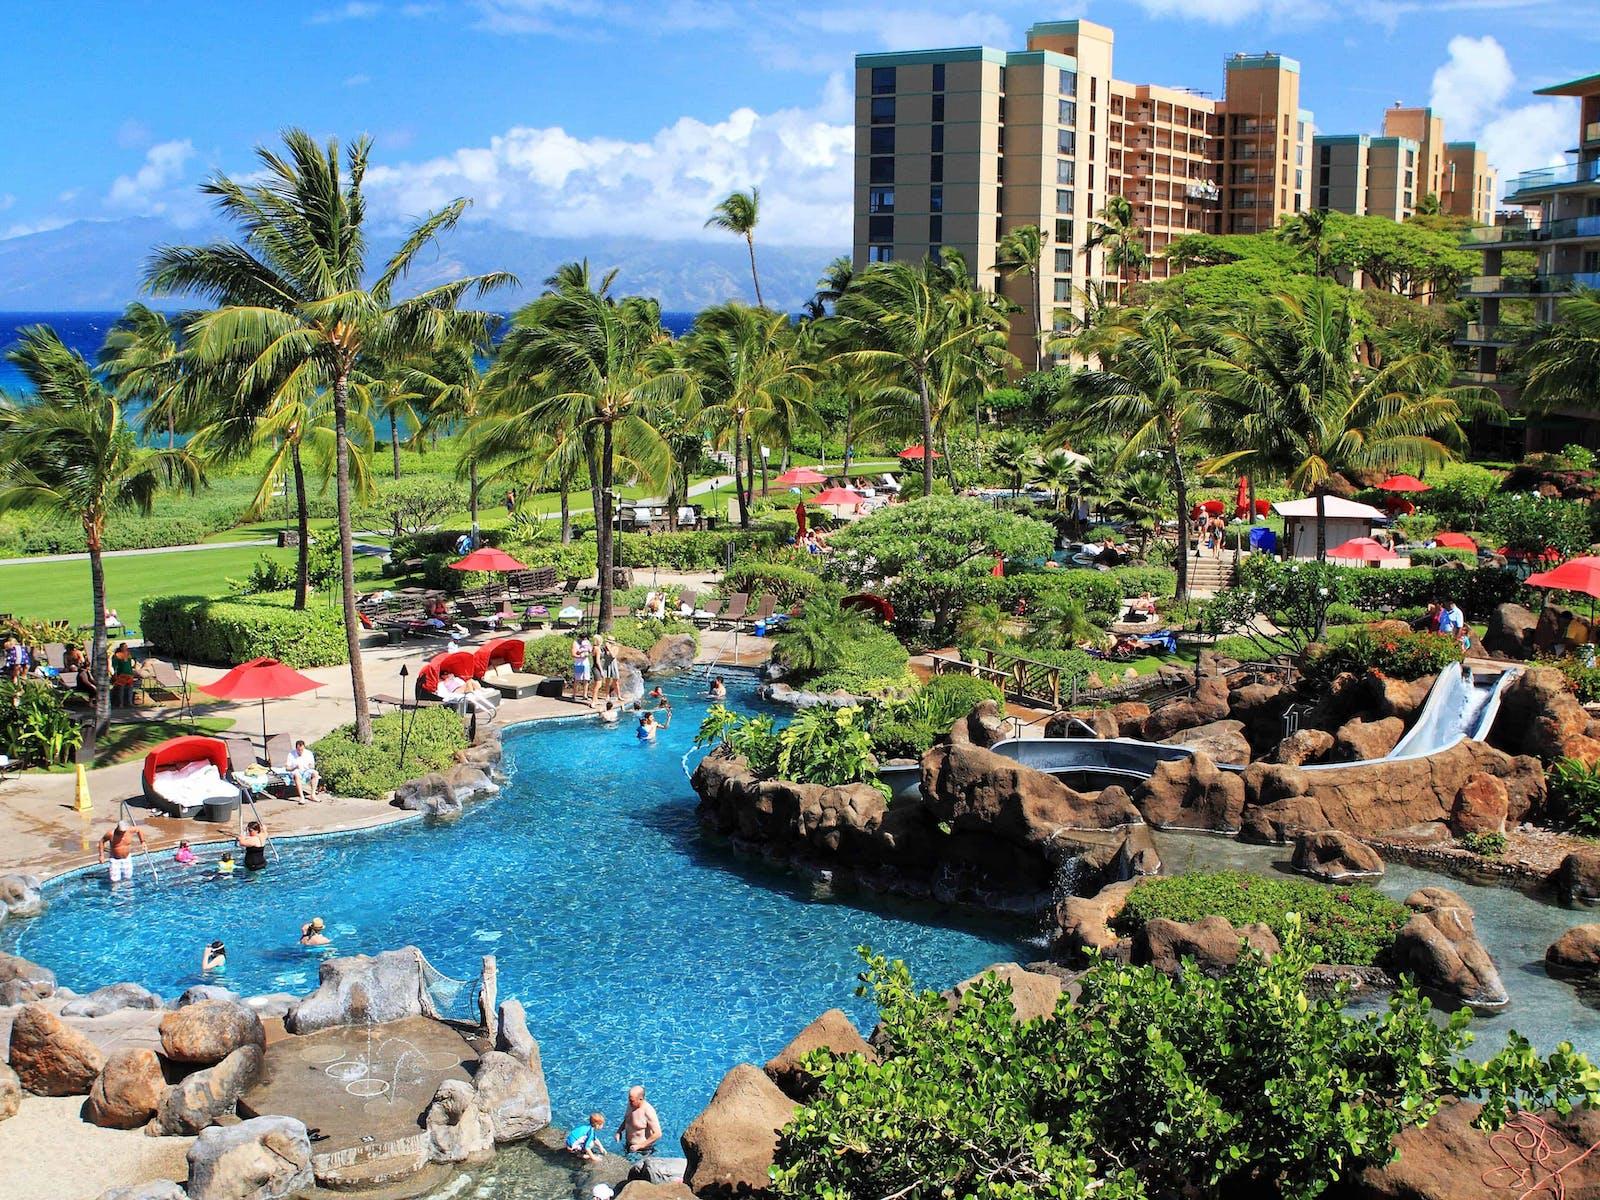 The swimming pool at a beach resort in Kaanapali, Maui